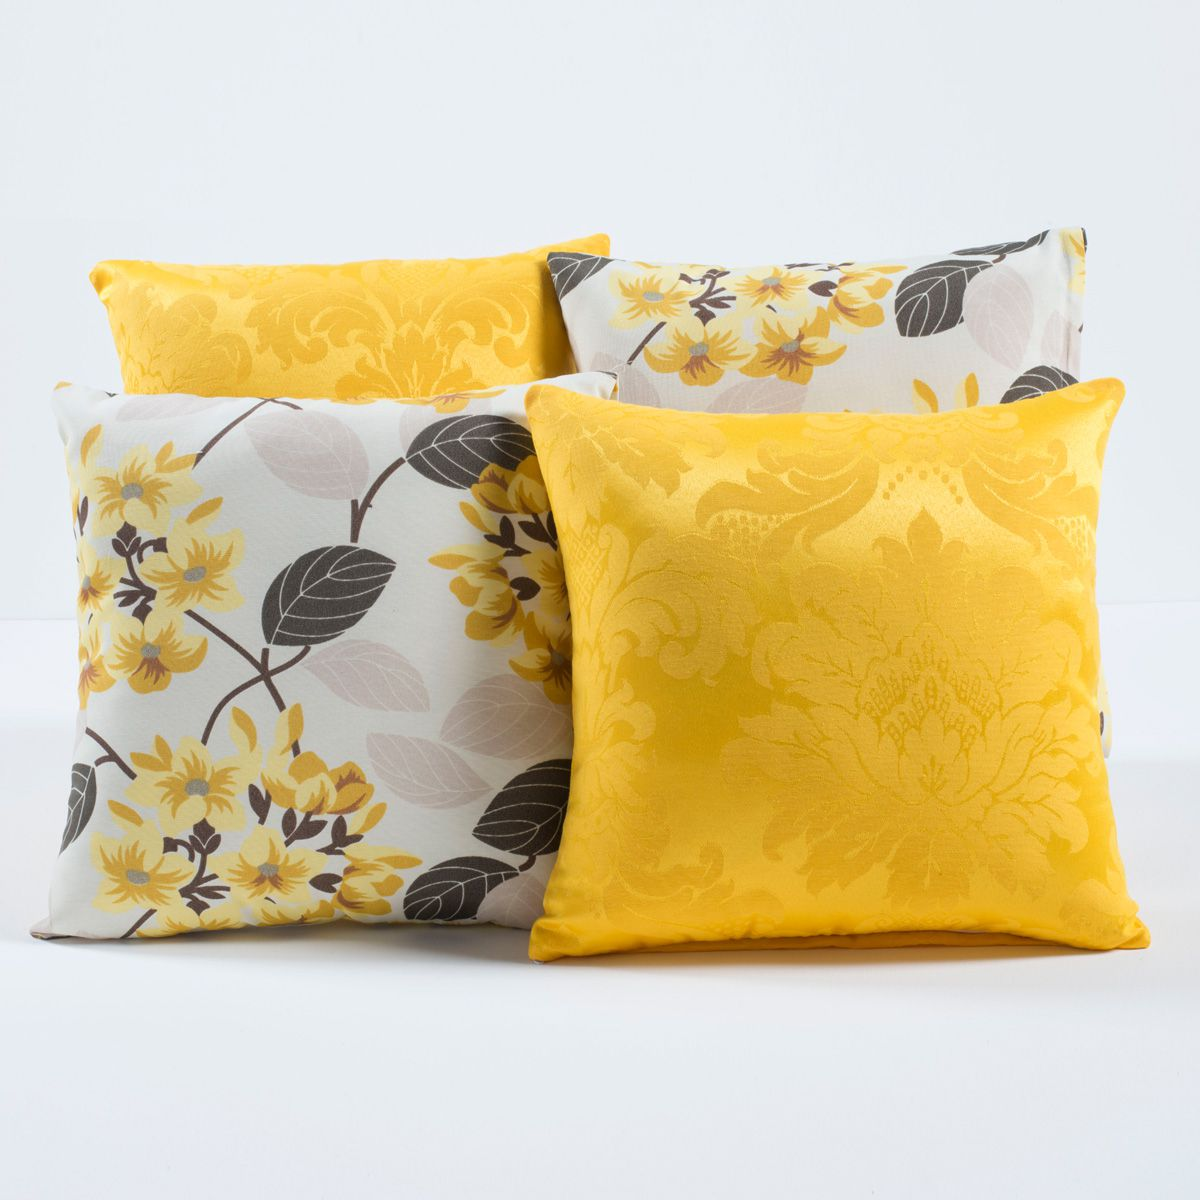 Kit c/ 4 Almofadas Cheias Decorativas Floral Amarelo/Branco 04 Peças c/ Refil